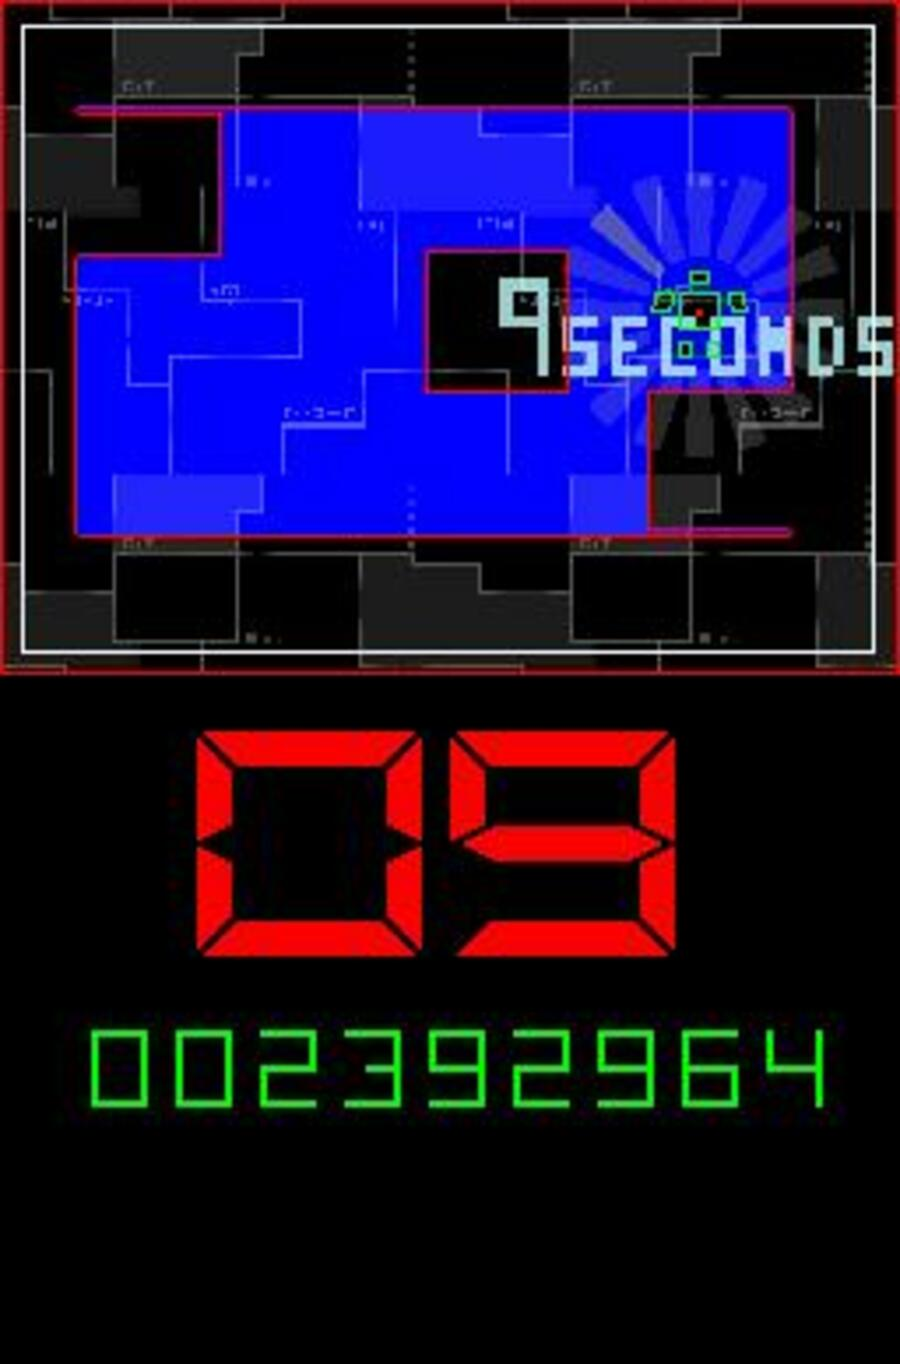 99Seconds Screenshot